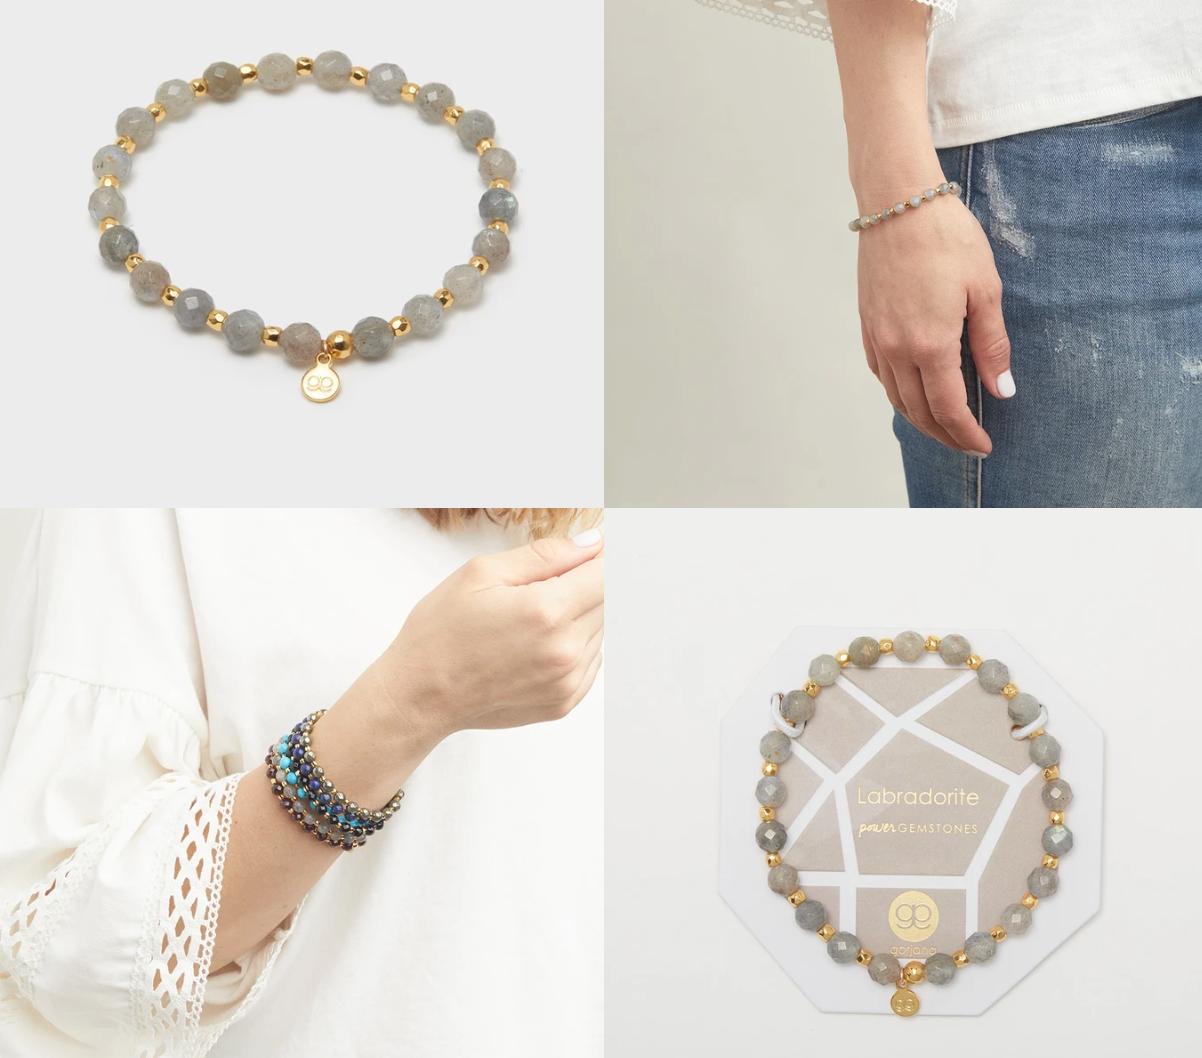 Power Gemstone Elastic Bracelet for Balance